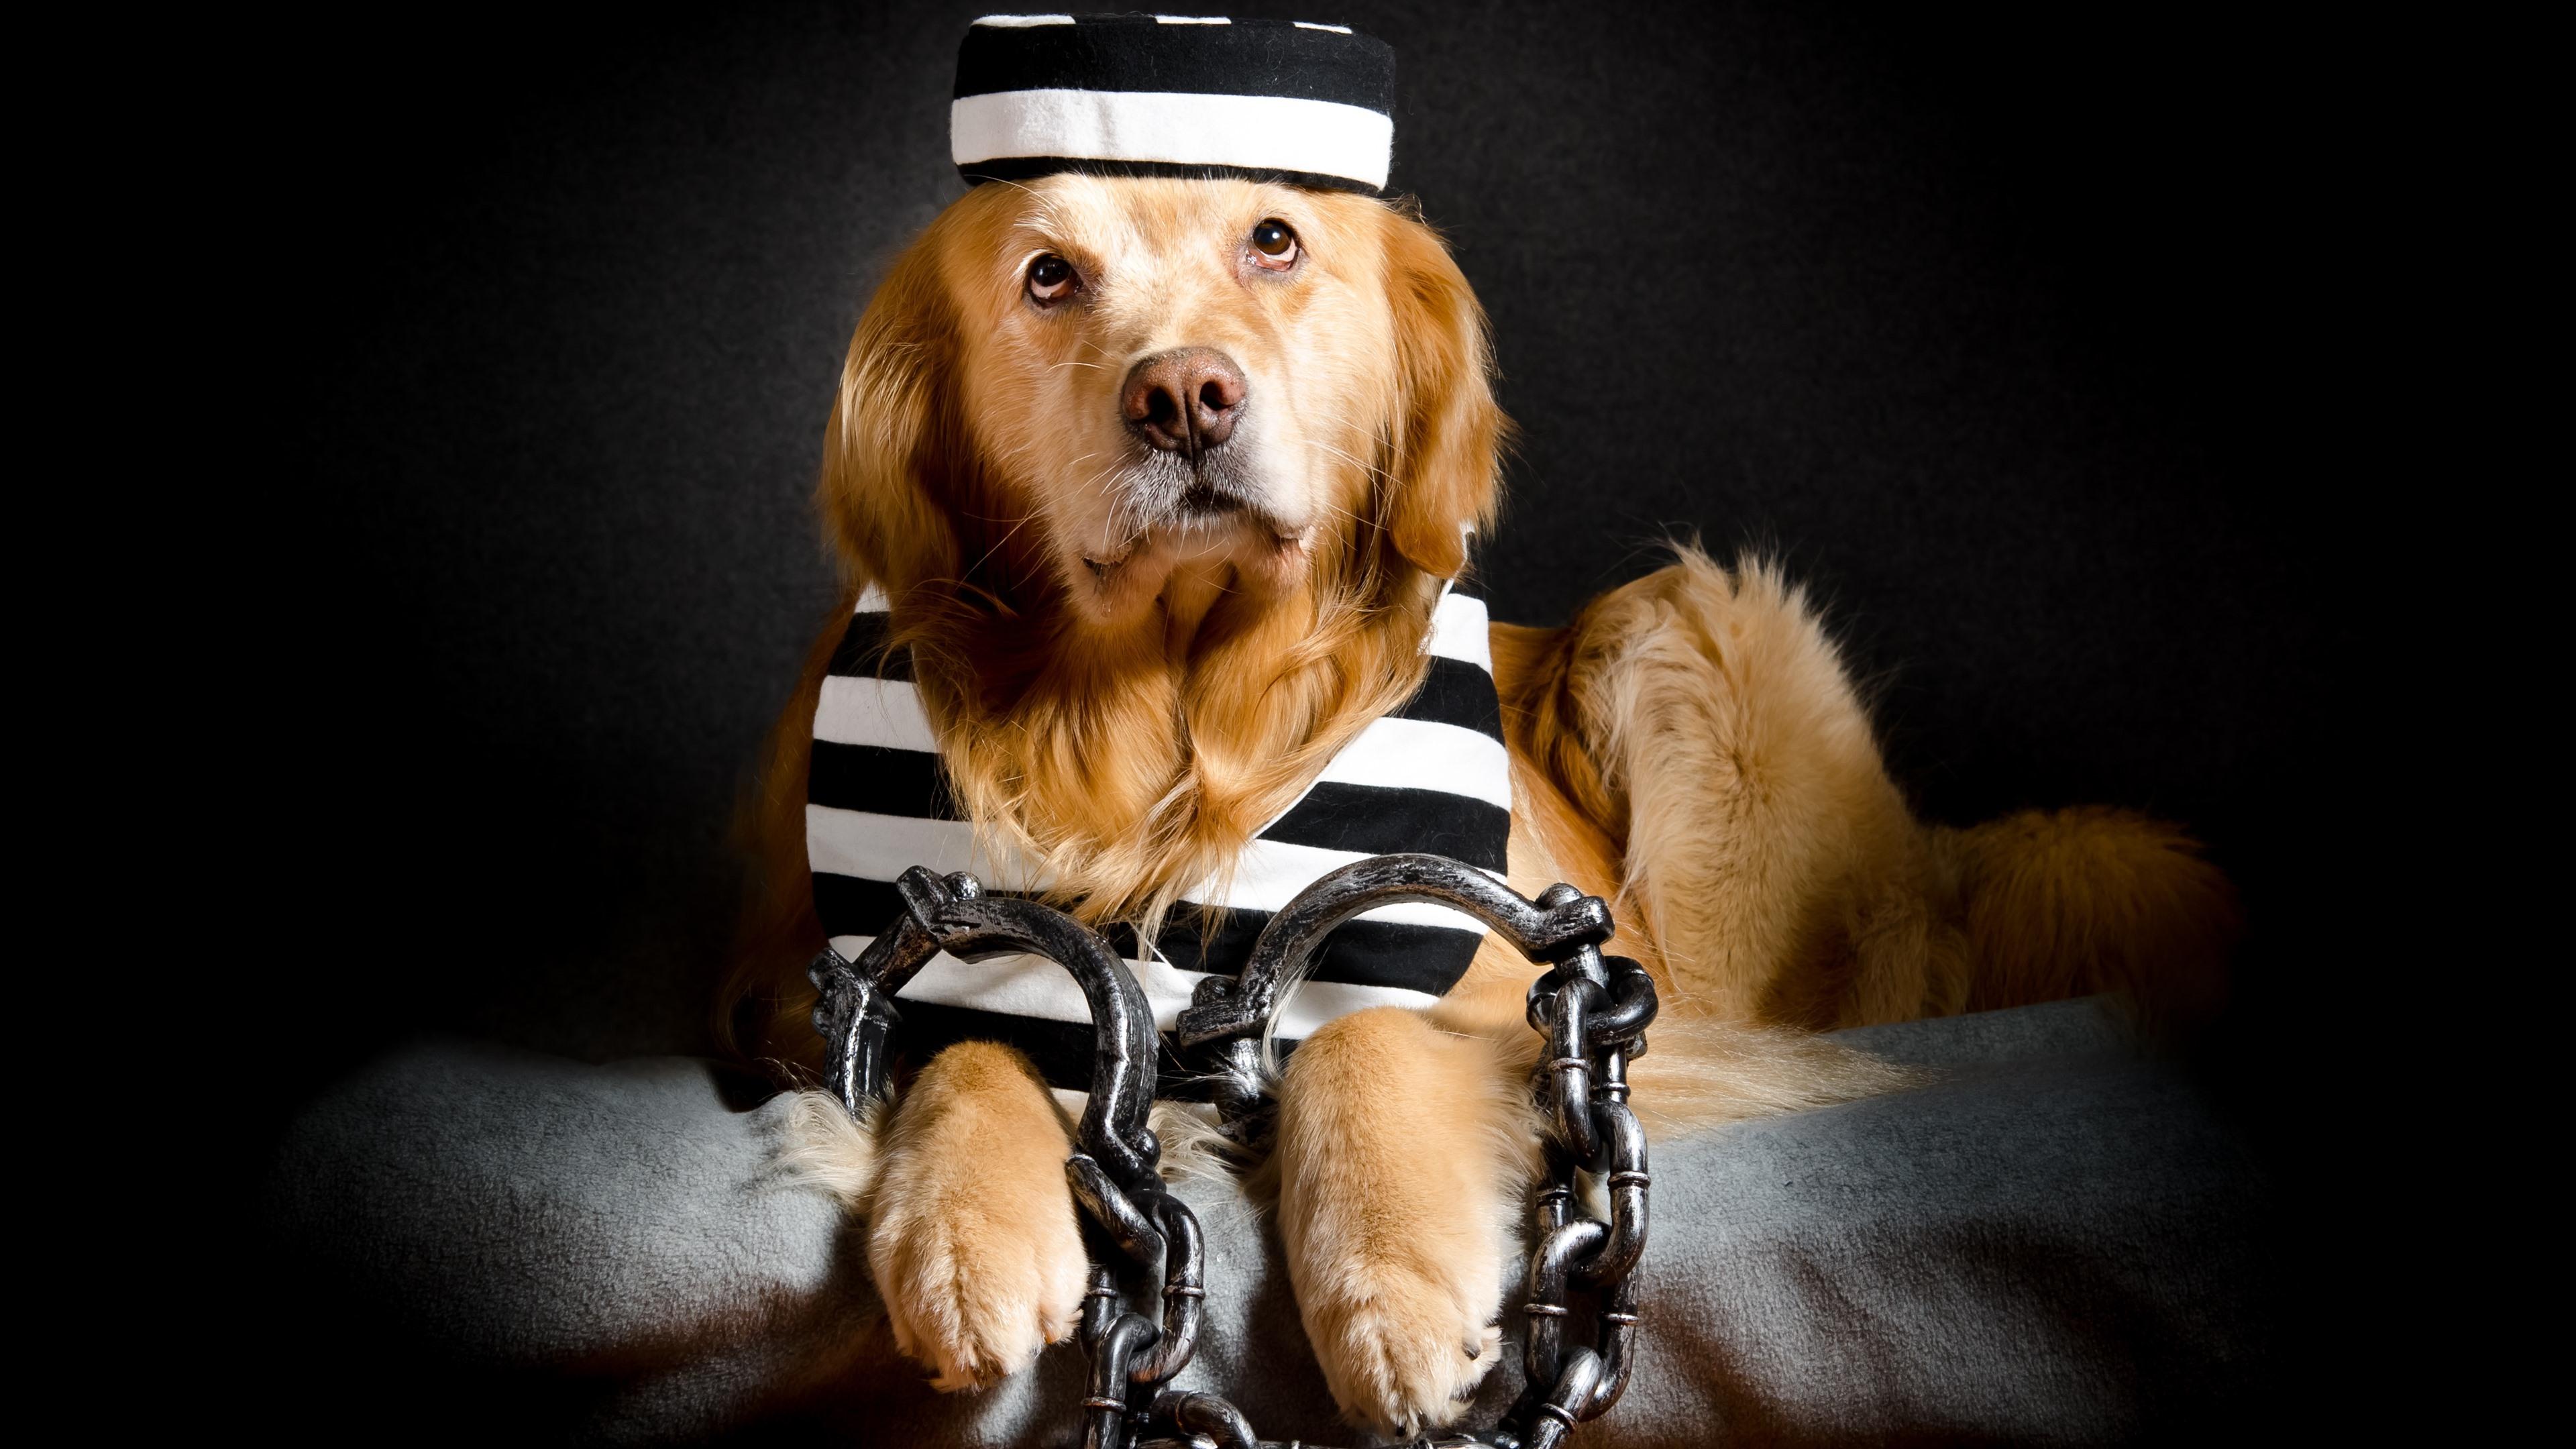 Wallpaper Funny Dog Prisoner Chain 3840x2160 Uhd 4k